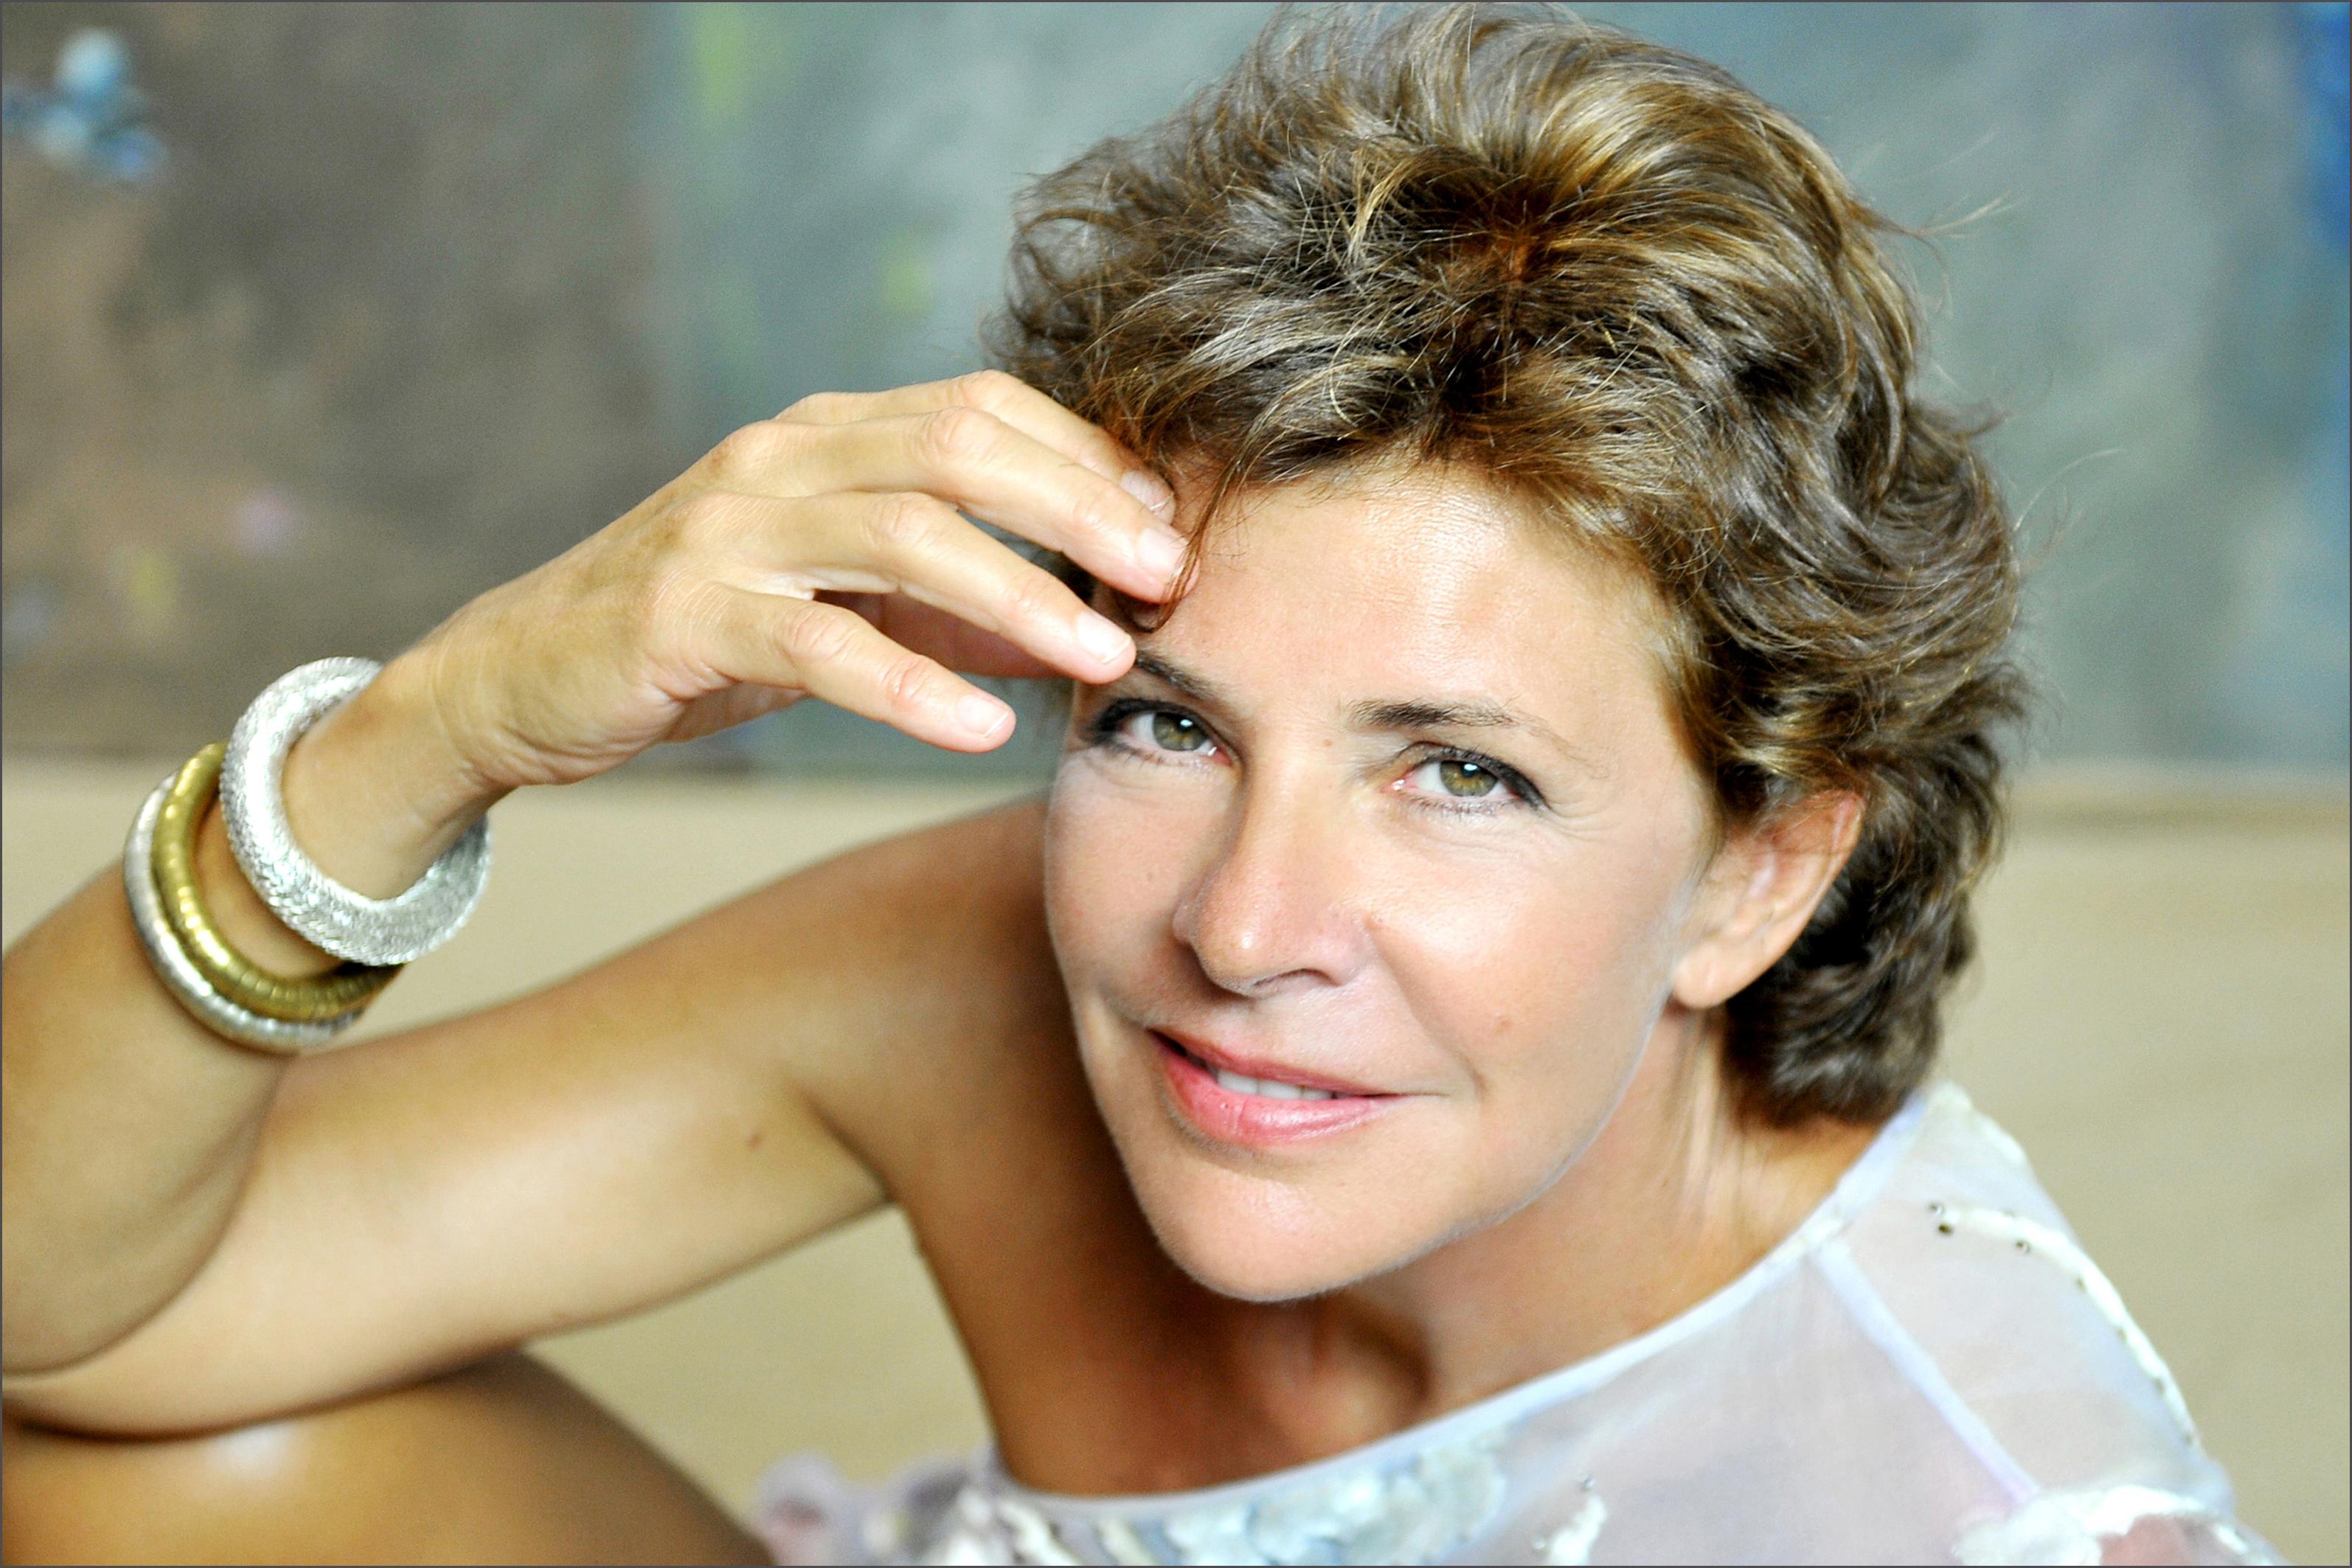 Pamela Villoresi - Movies, Bio and Lists on MUBI